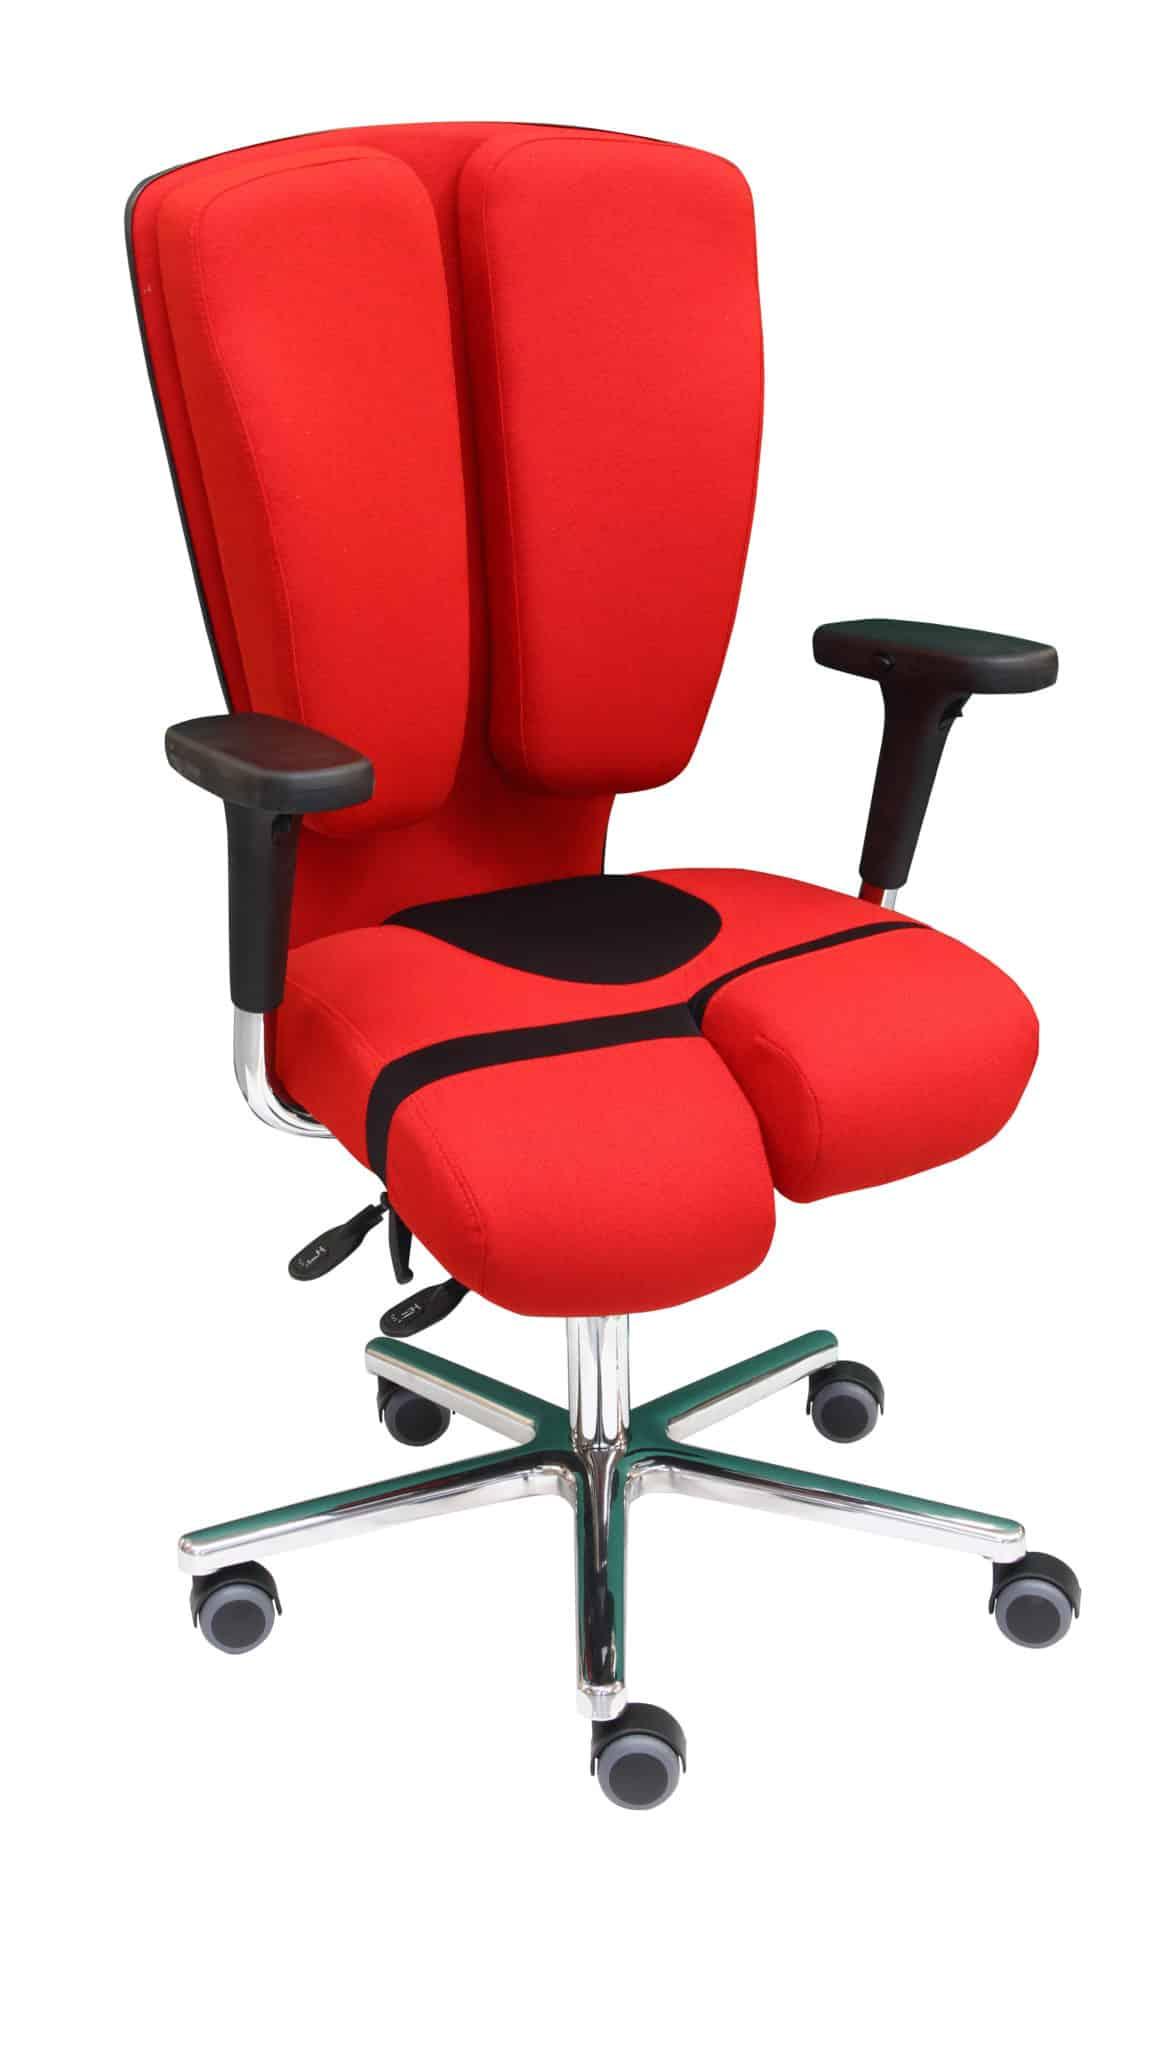 KHOL ARTHRODESIO siege ergonomic environnement médical